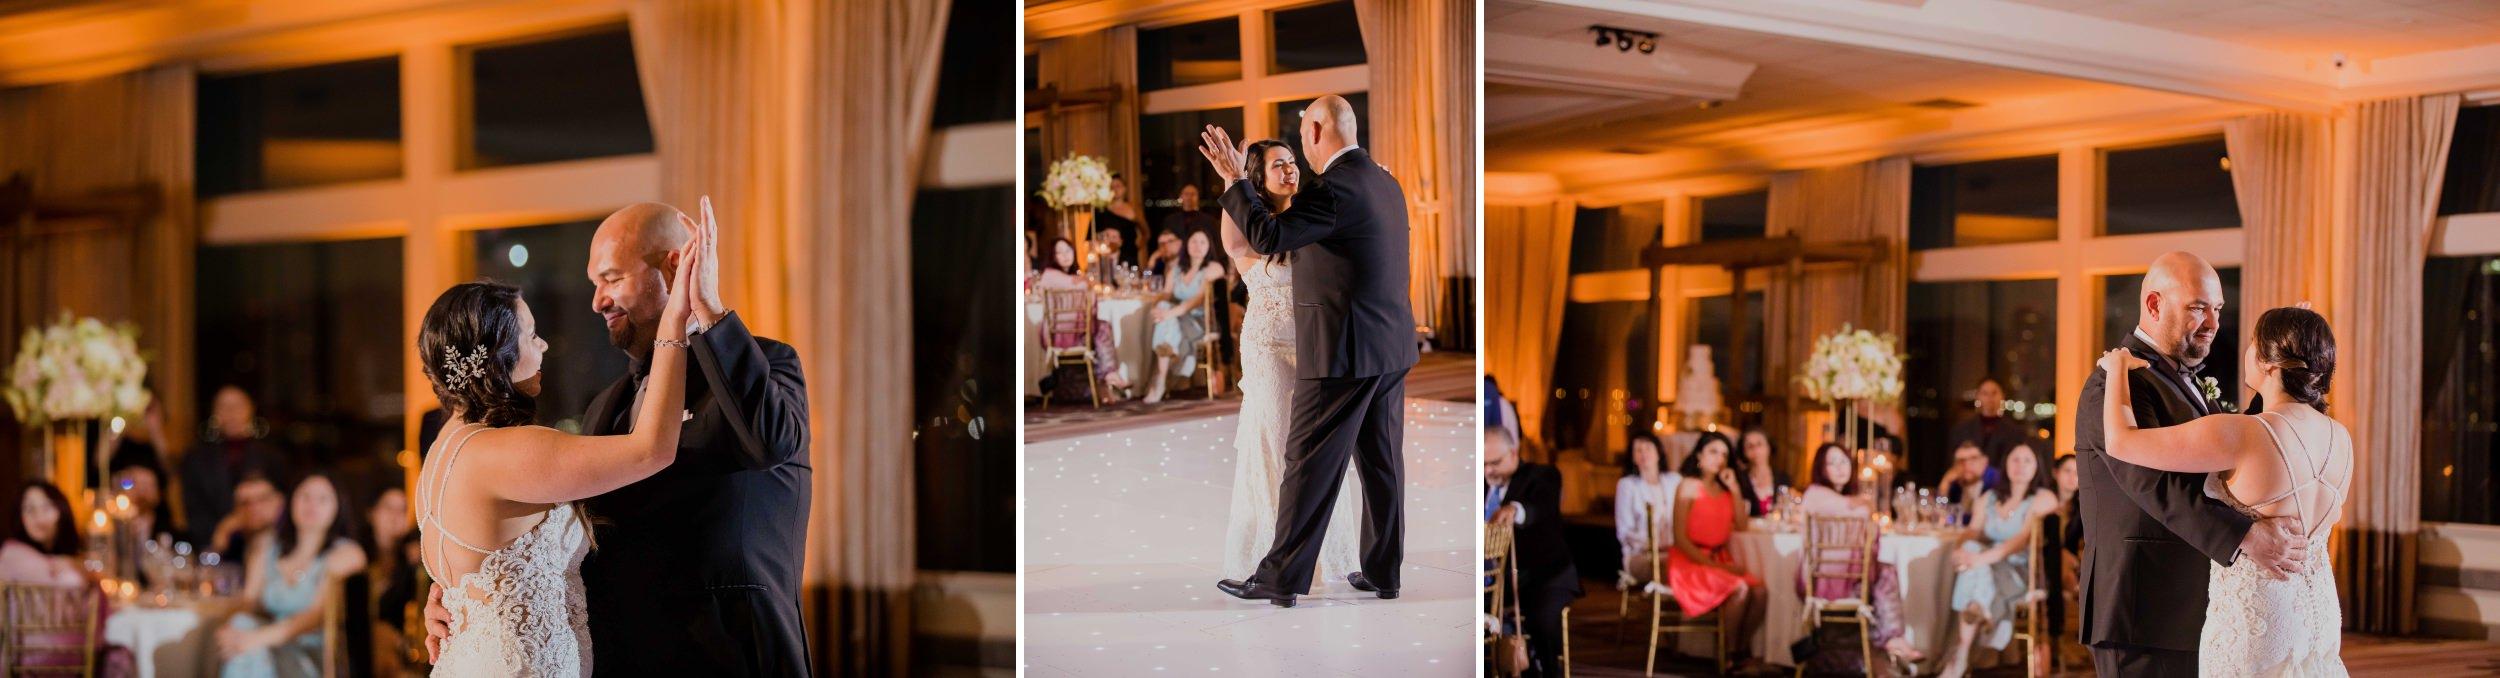 Wedding - Rusty Pelican - Key Biscayne - Santy Martinez Photography 39.jpg